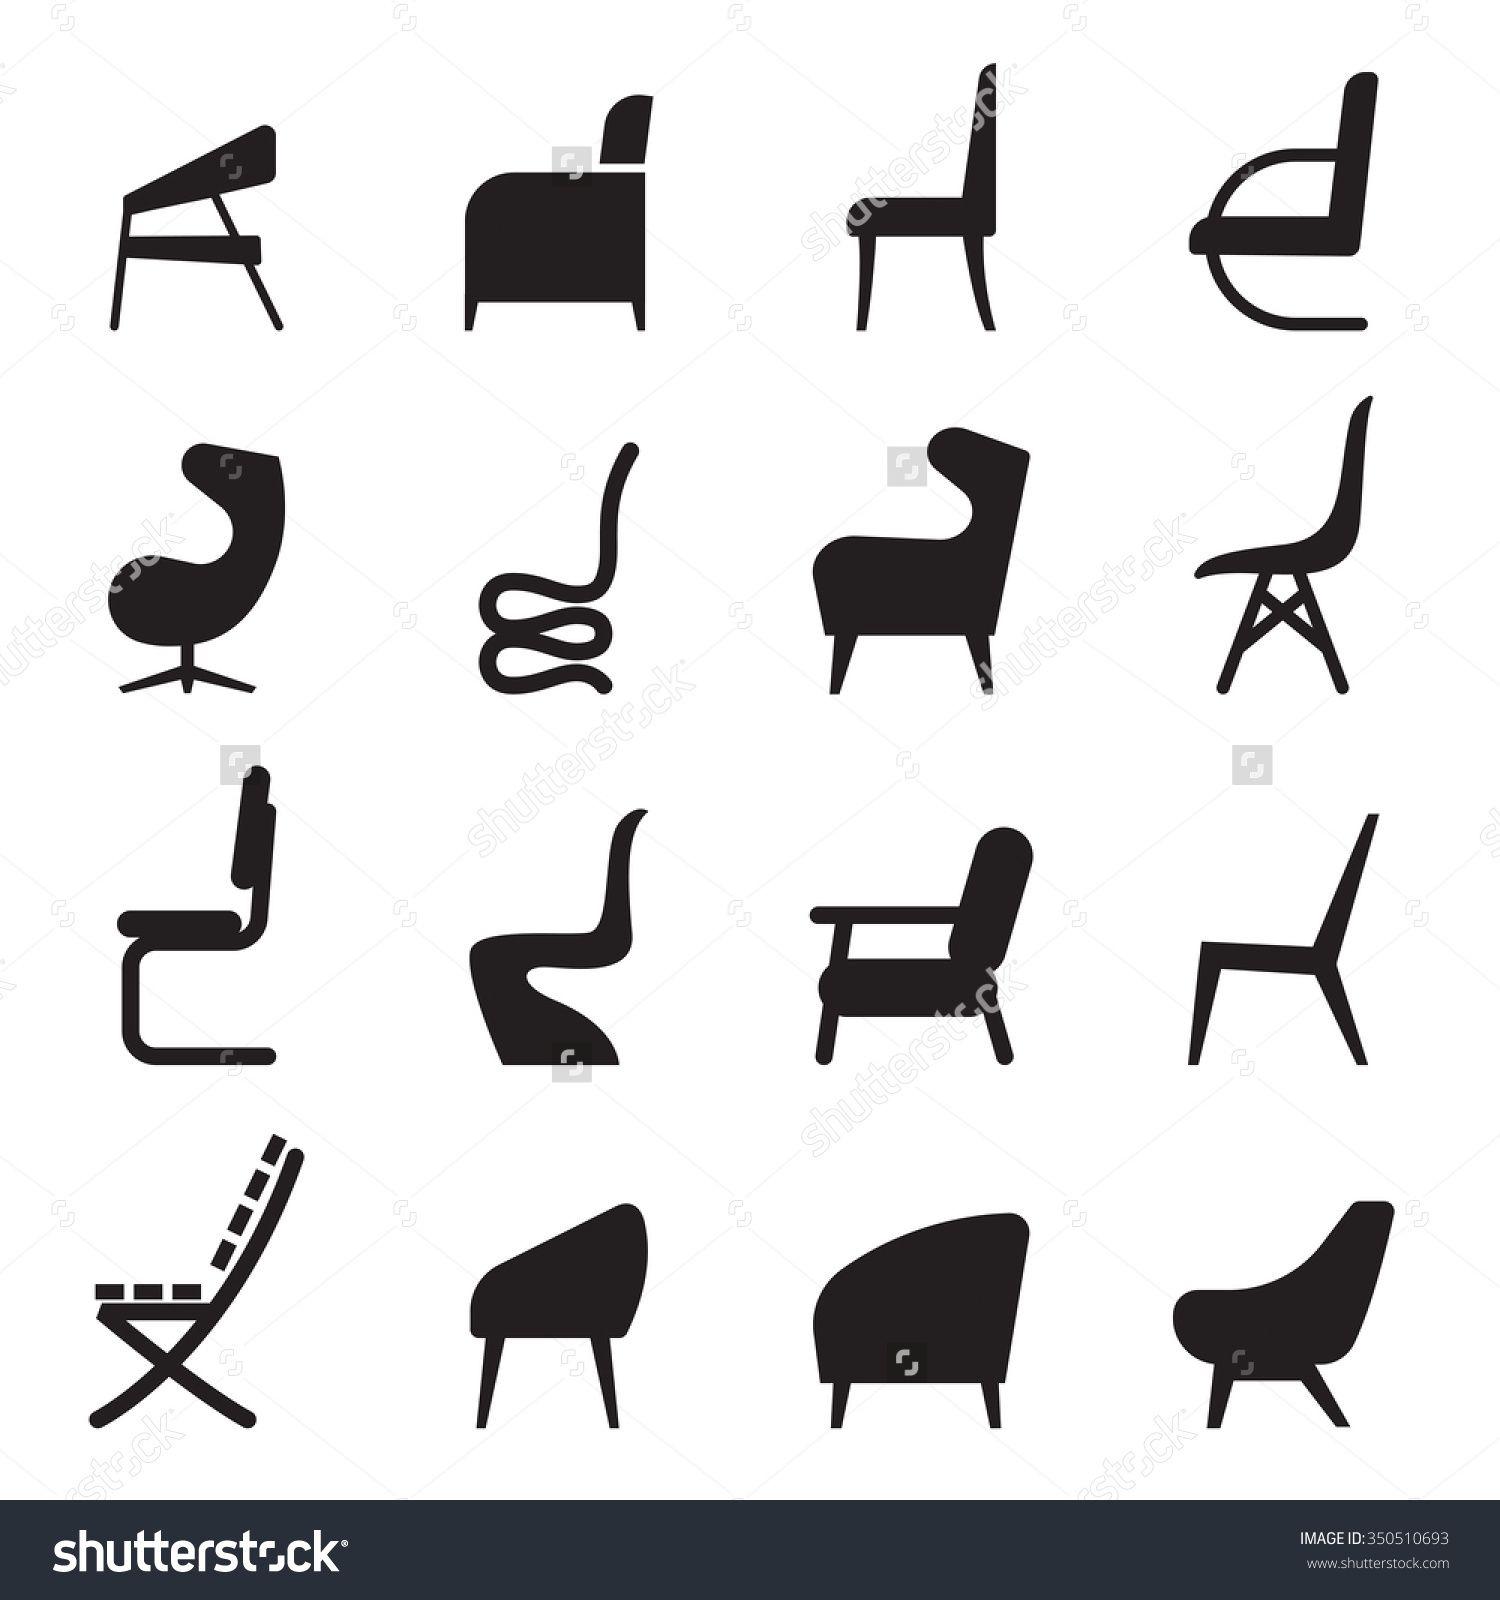 Bar Chair Stock Vectors Vector Clip Art Icon Set Icon Set Vector Illustration